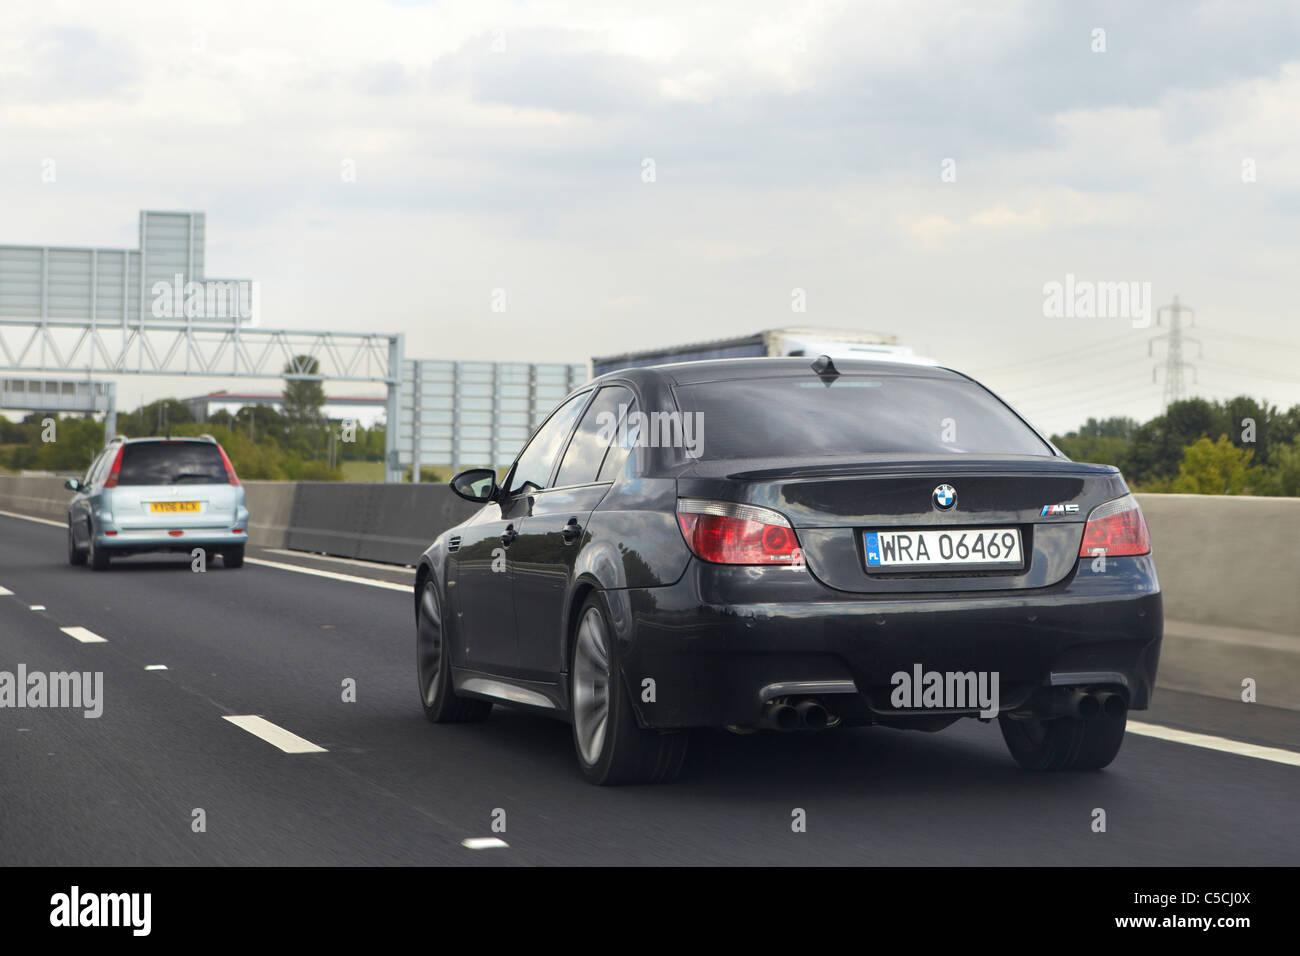 Black Bmw M5 E60 On Motorway Uk Stock Photo Alamy